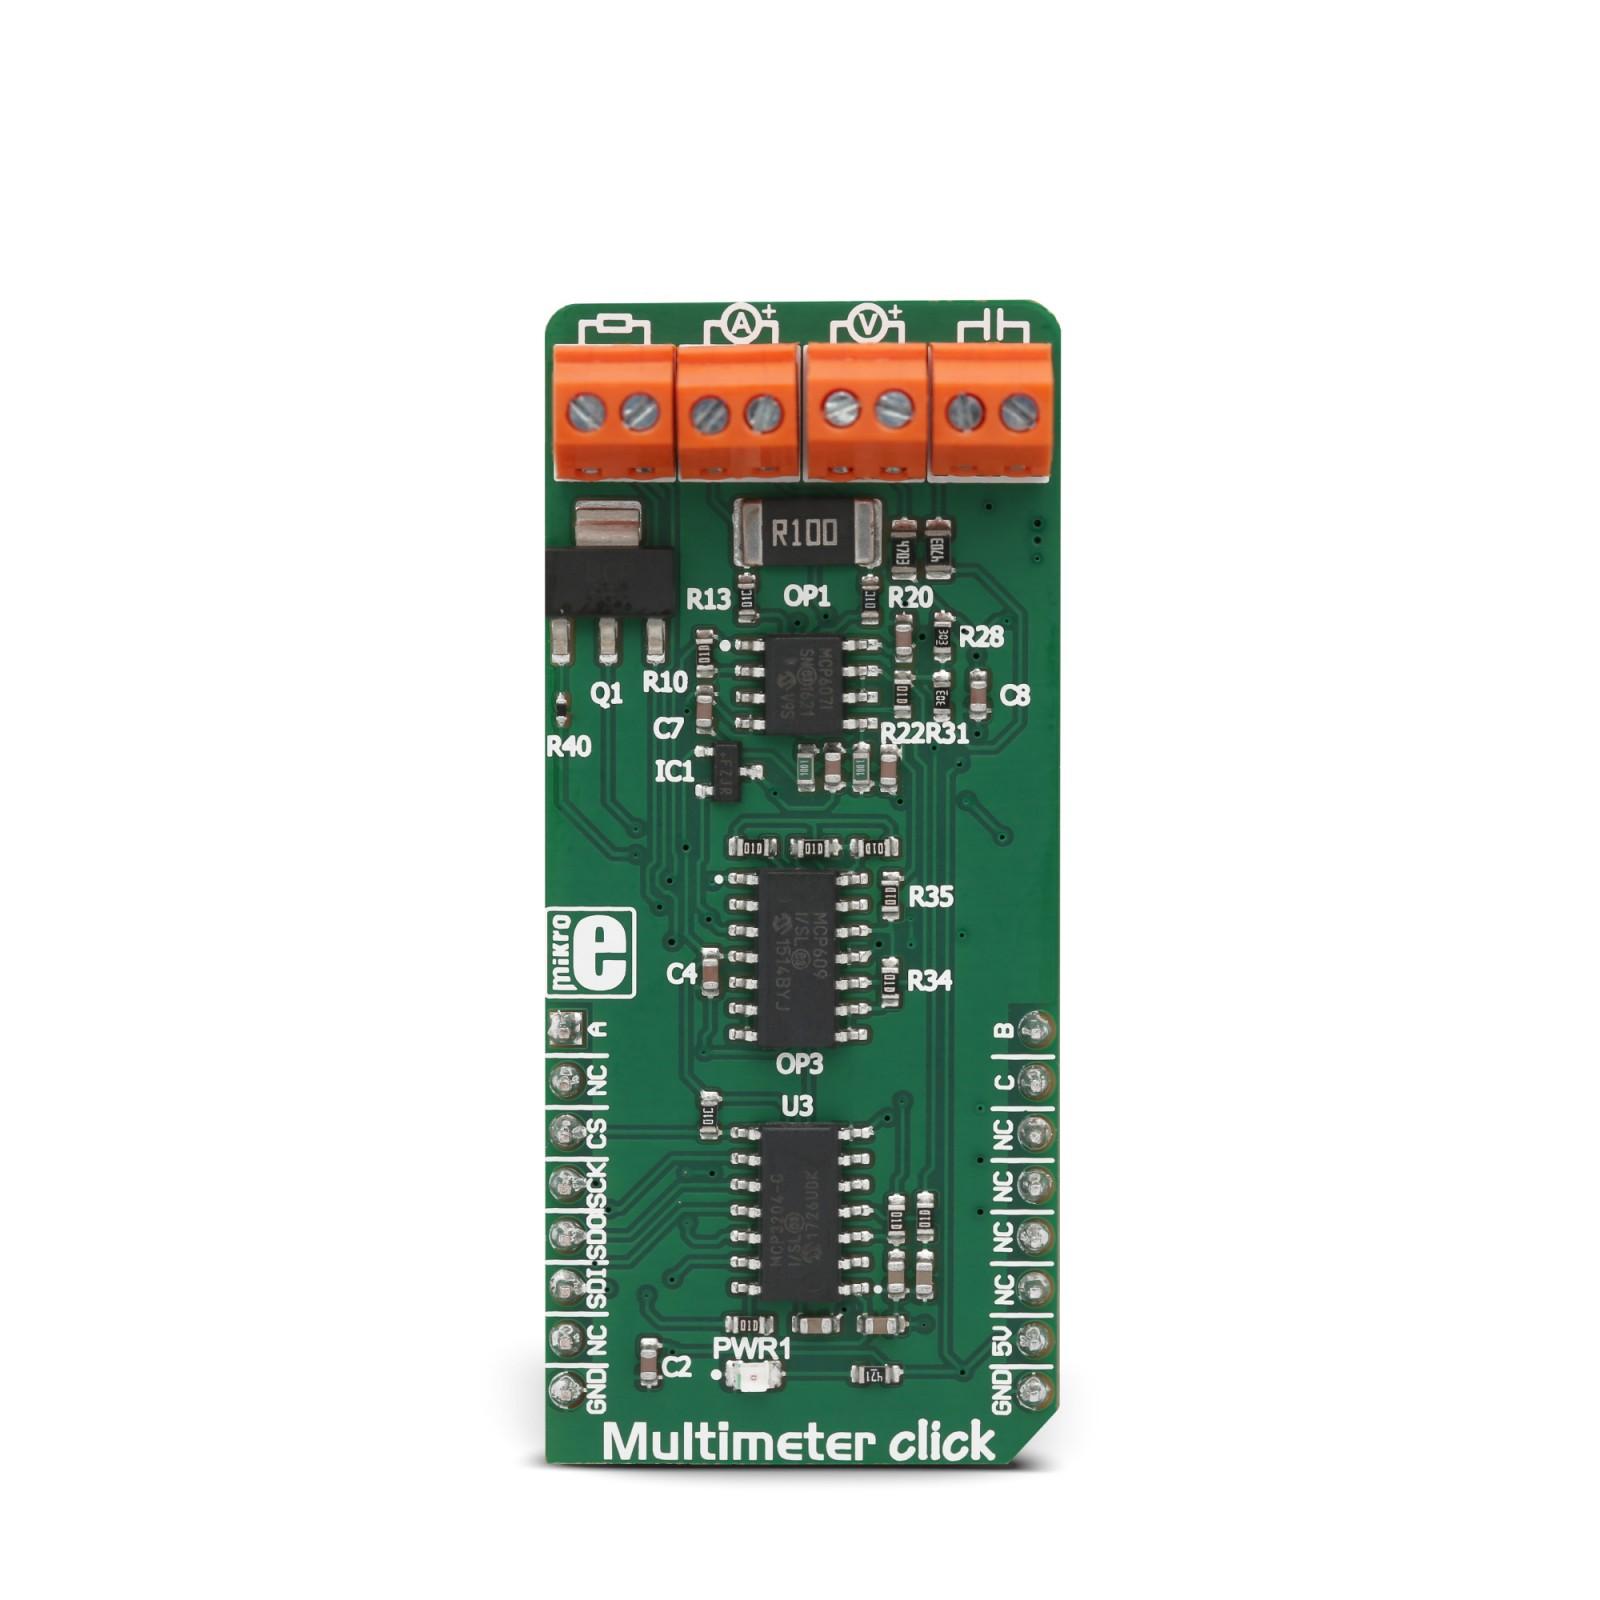 Multimeter Click Mikroelektronika Digital Voltmeter Using 8051 Microcontroller Circuit Diagram Mgctlbxnmzp Mgctlbxv5112 Mgctlbxlc Mgctlbxpprestashop